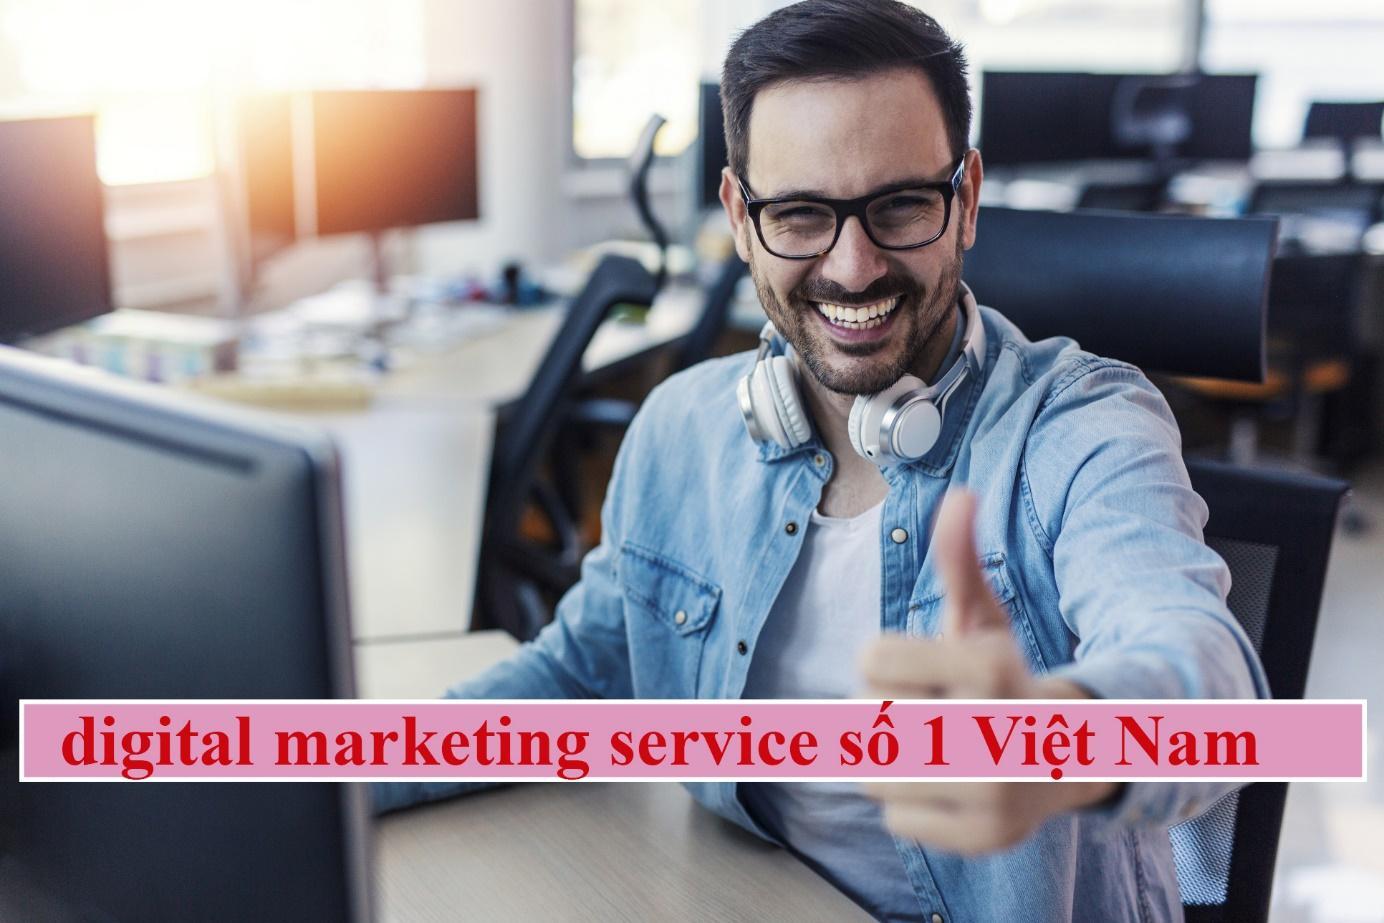 On Digitals cung cấp digital marketing service cực kỳ tốt